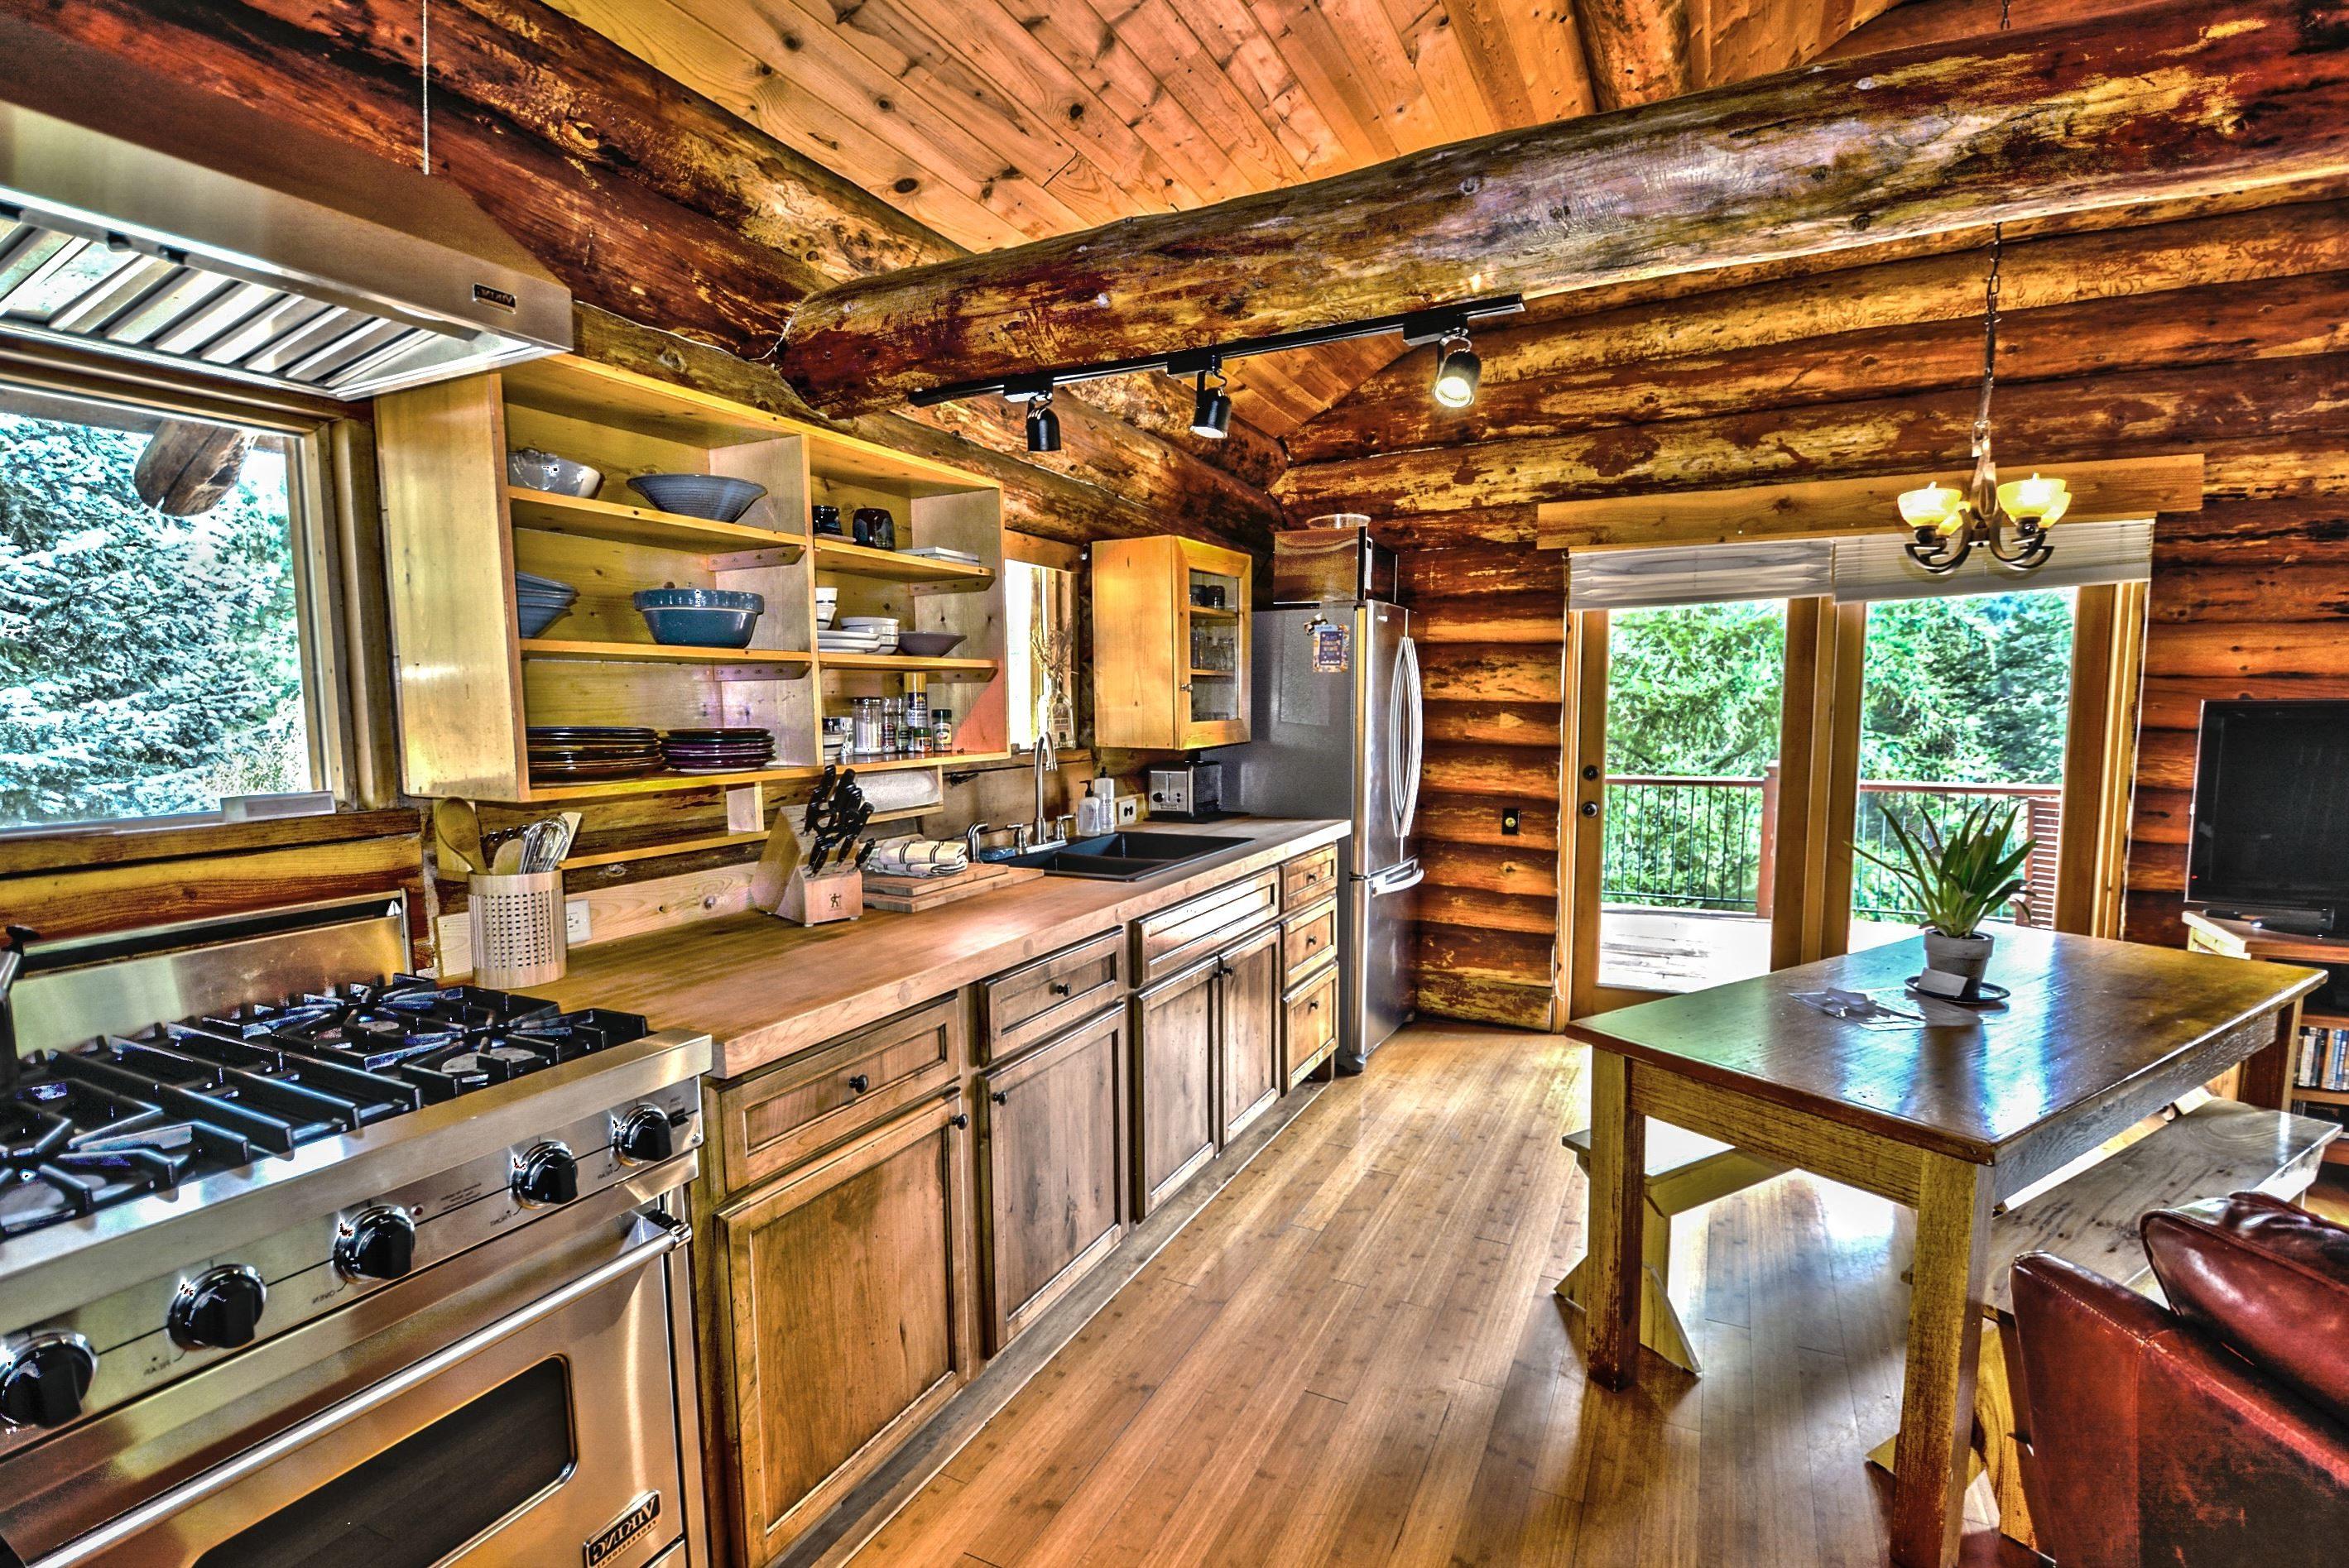 Imagen gratis madera cocina estufa interiores muebles for Interior de la casa de madera moderna